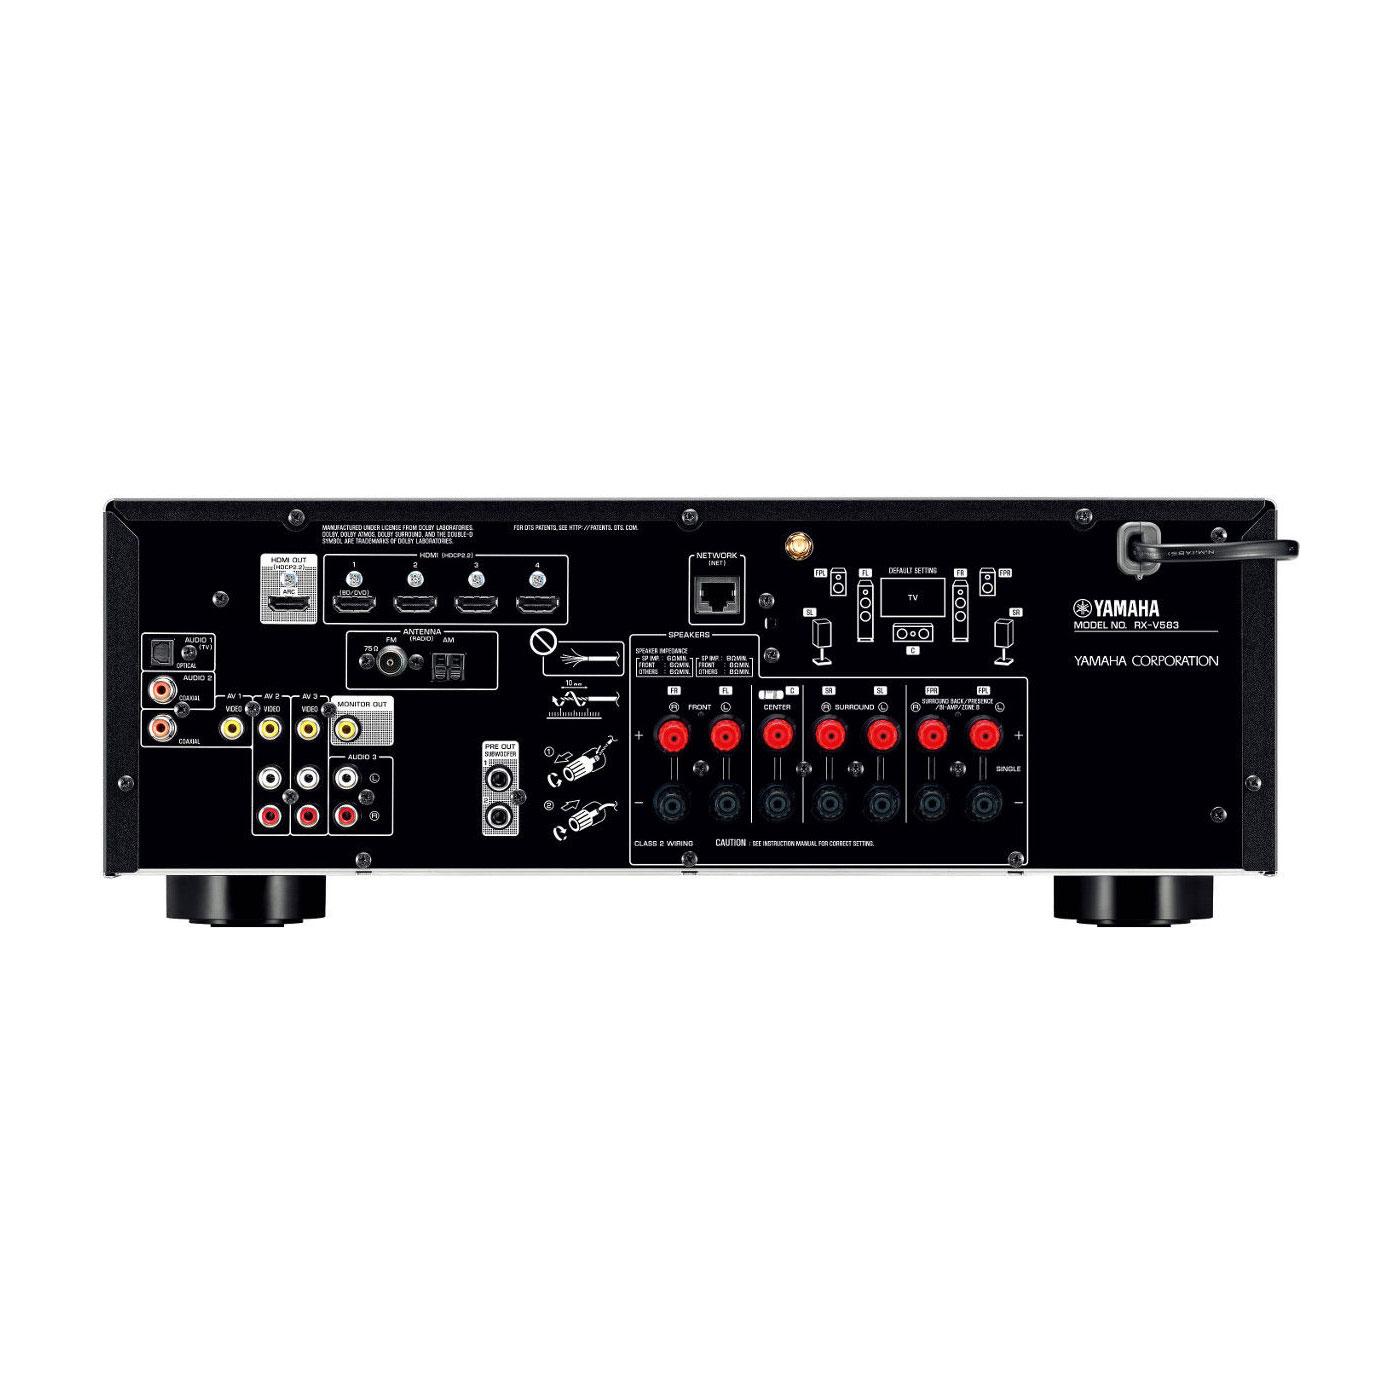 Yamaha musiccast rx v583 titane ns p40 ensemble home for Yamaha ns p20 vs ns p40